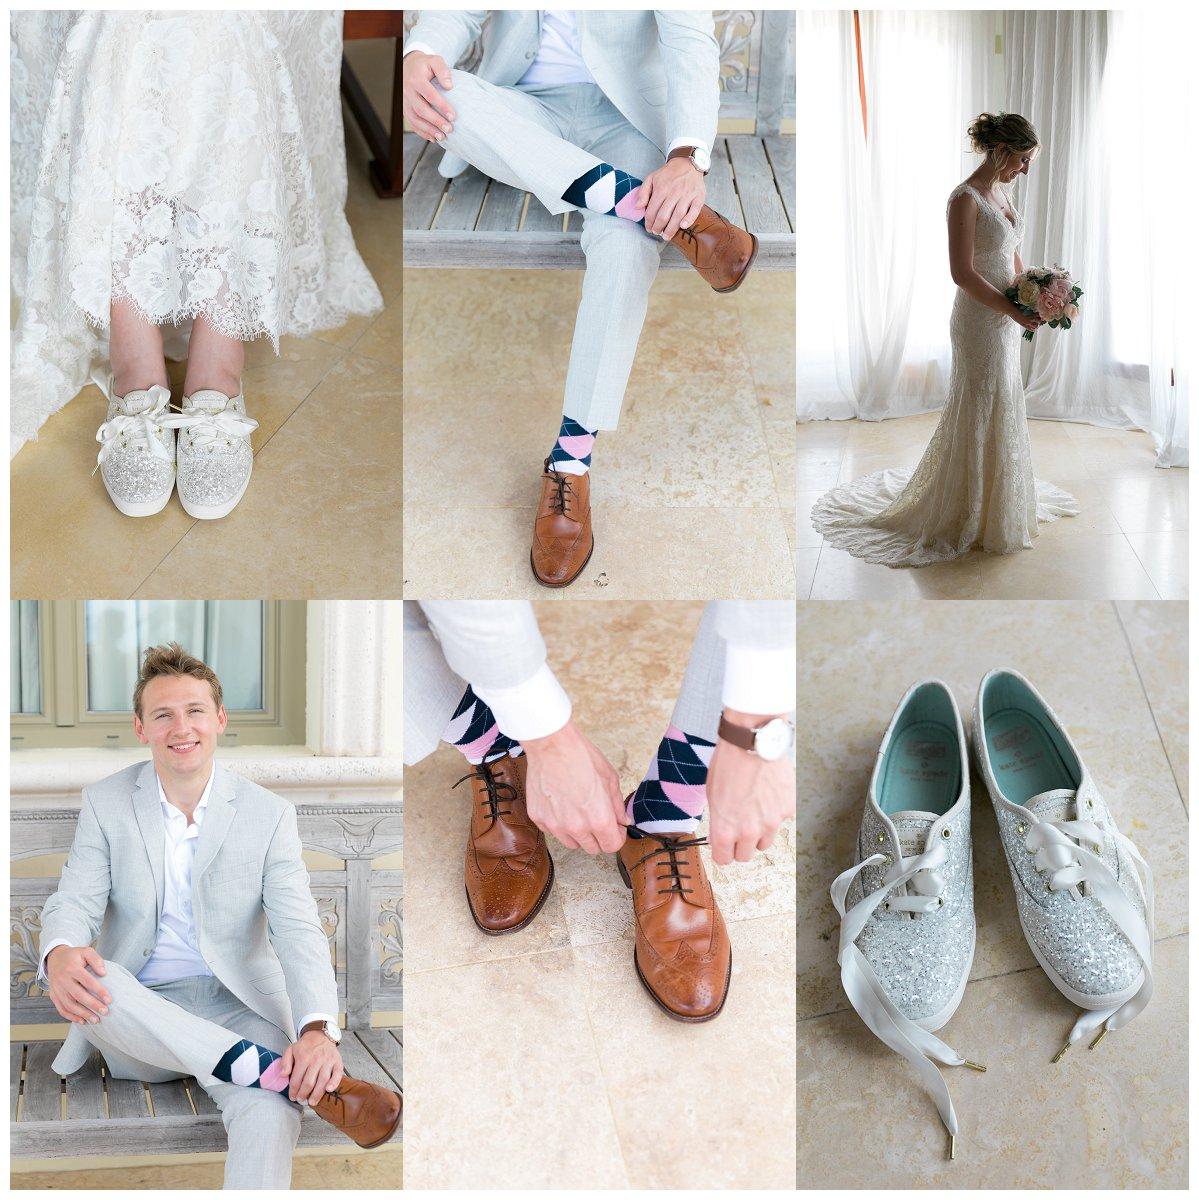 st-thomas-wedding-planners